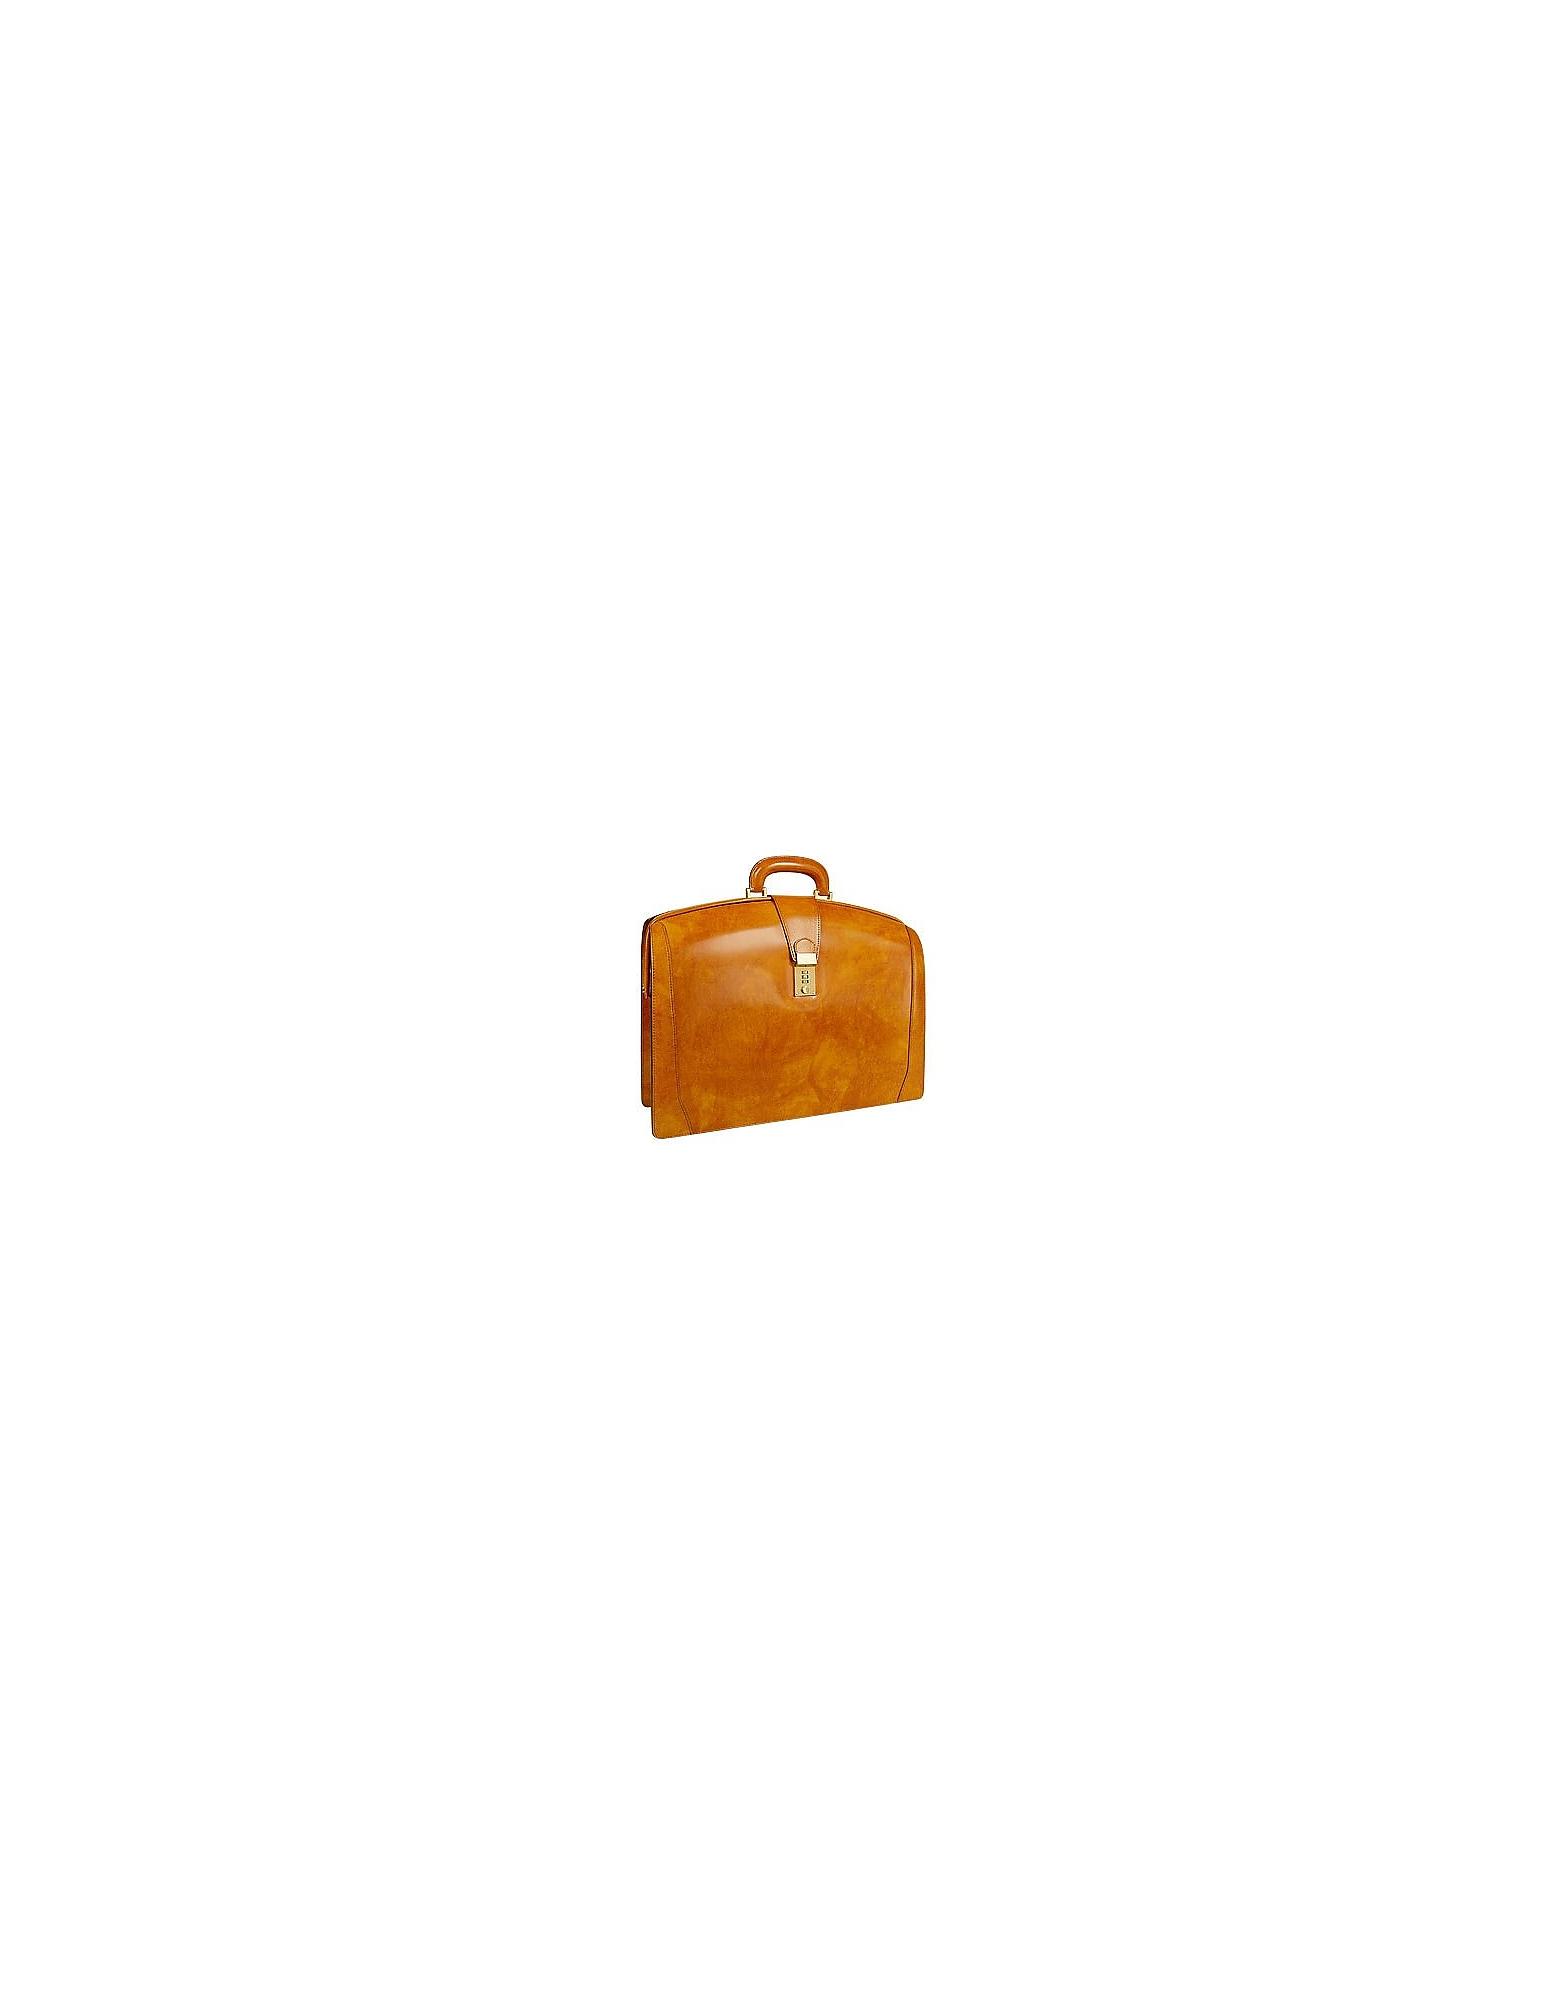 Pratesi Designer Briefcases, Brunelleschi Italian Leather Briefcase